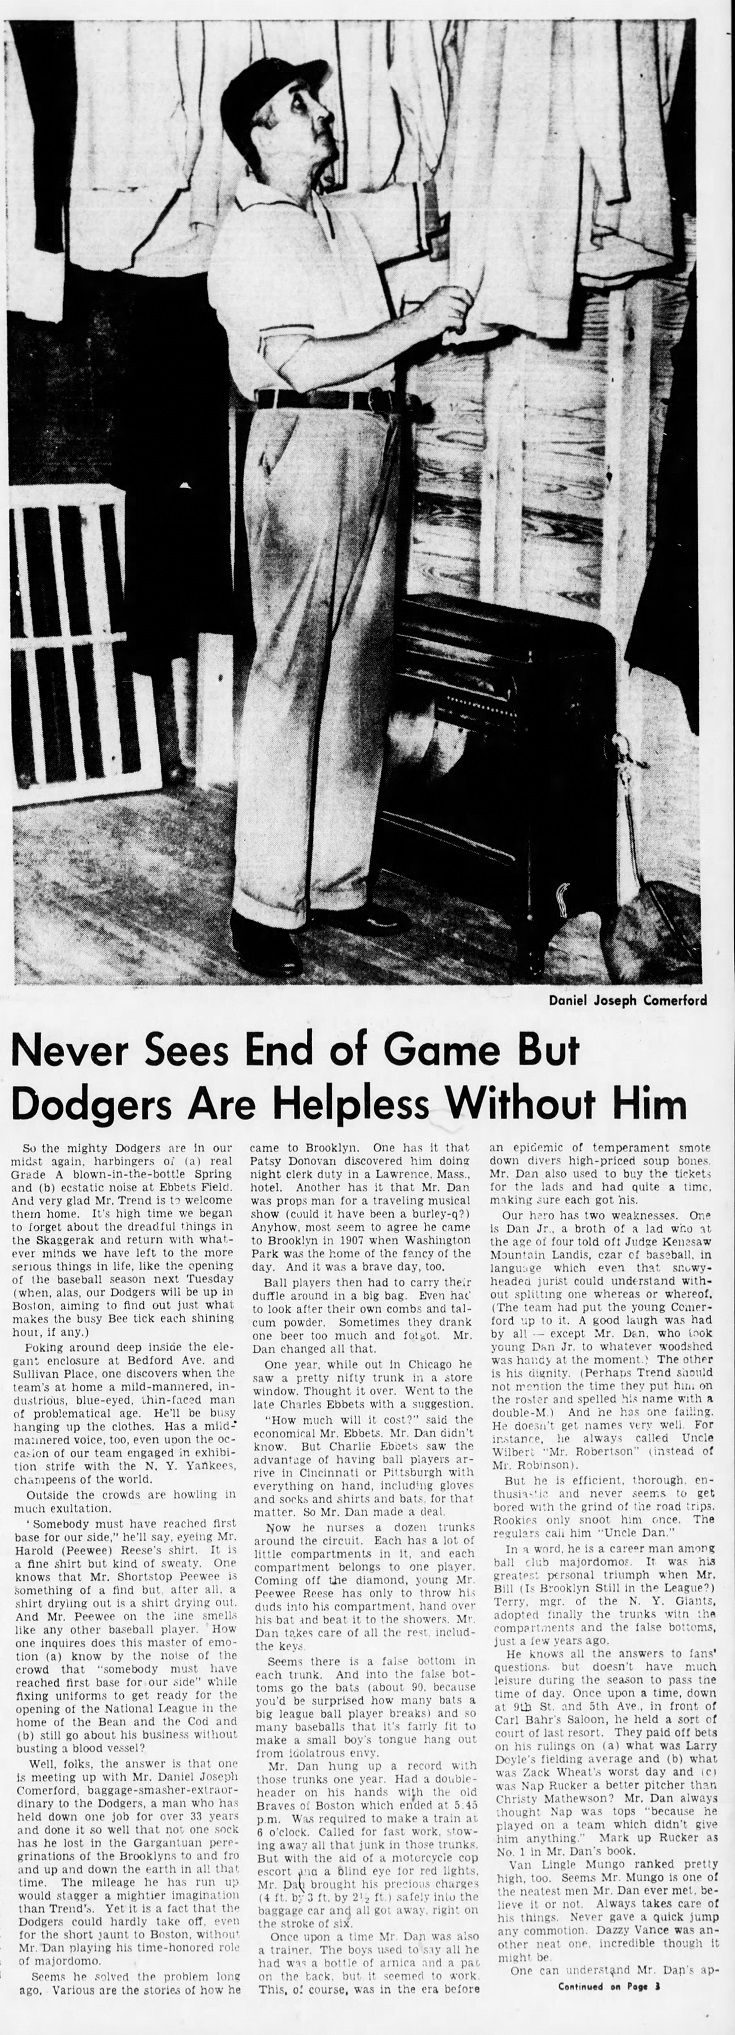 The_Brooklyn_Daily_Eagle_Sun__Apr_14__1940_(4).jpg